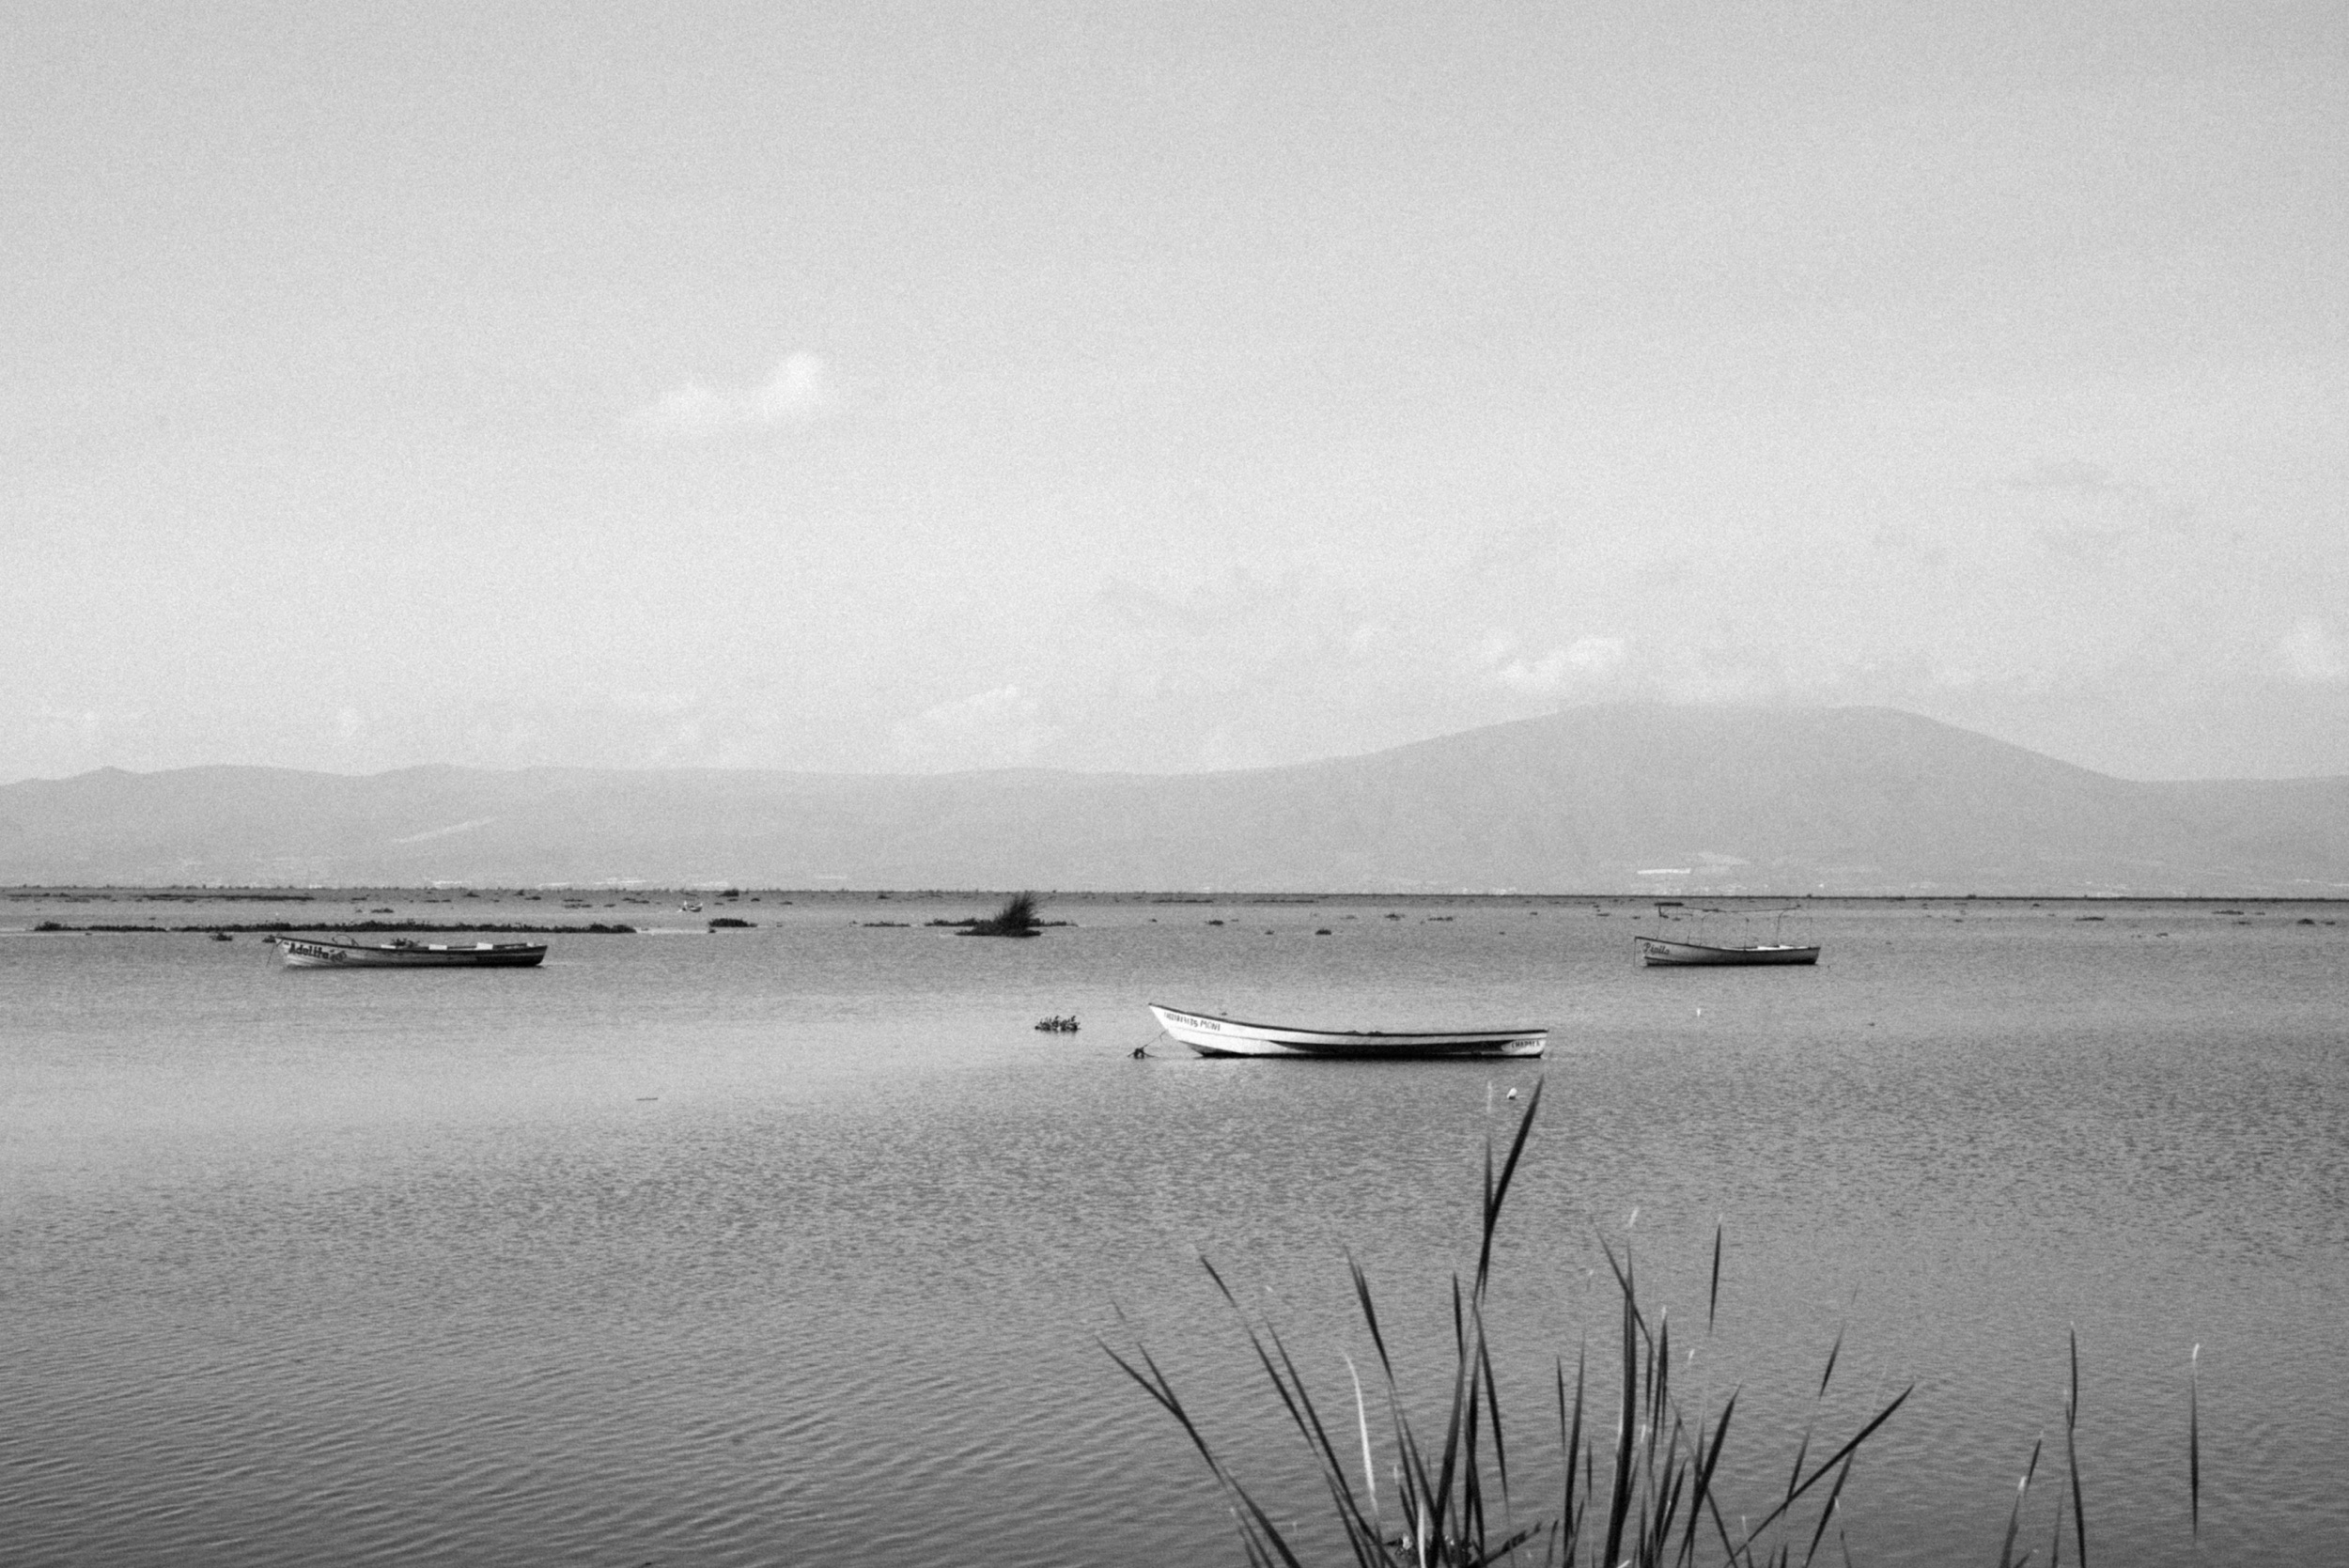 stills.  Leica M(Typ240) + Summicron-M 50mm f/2.